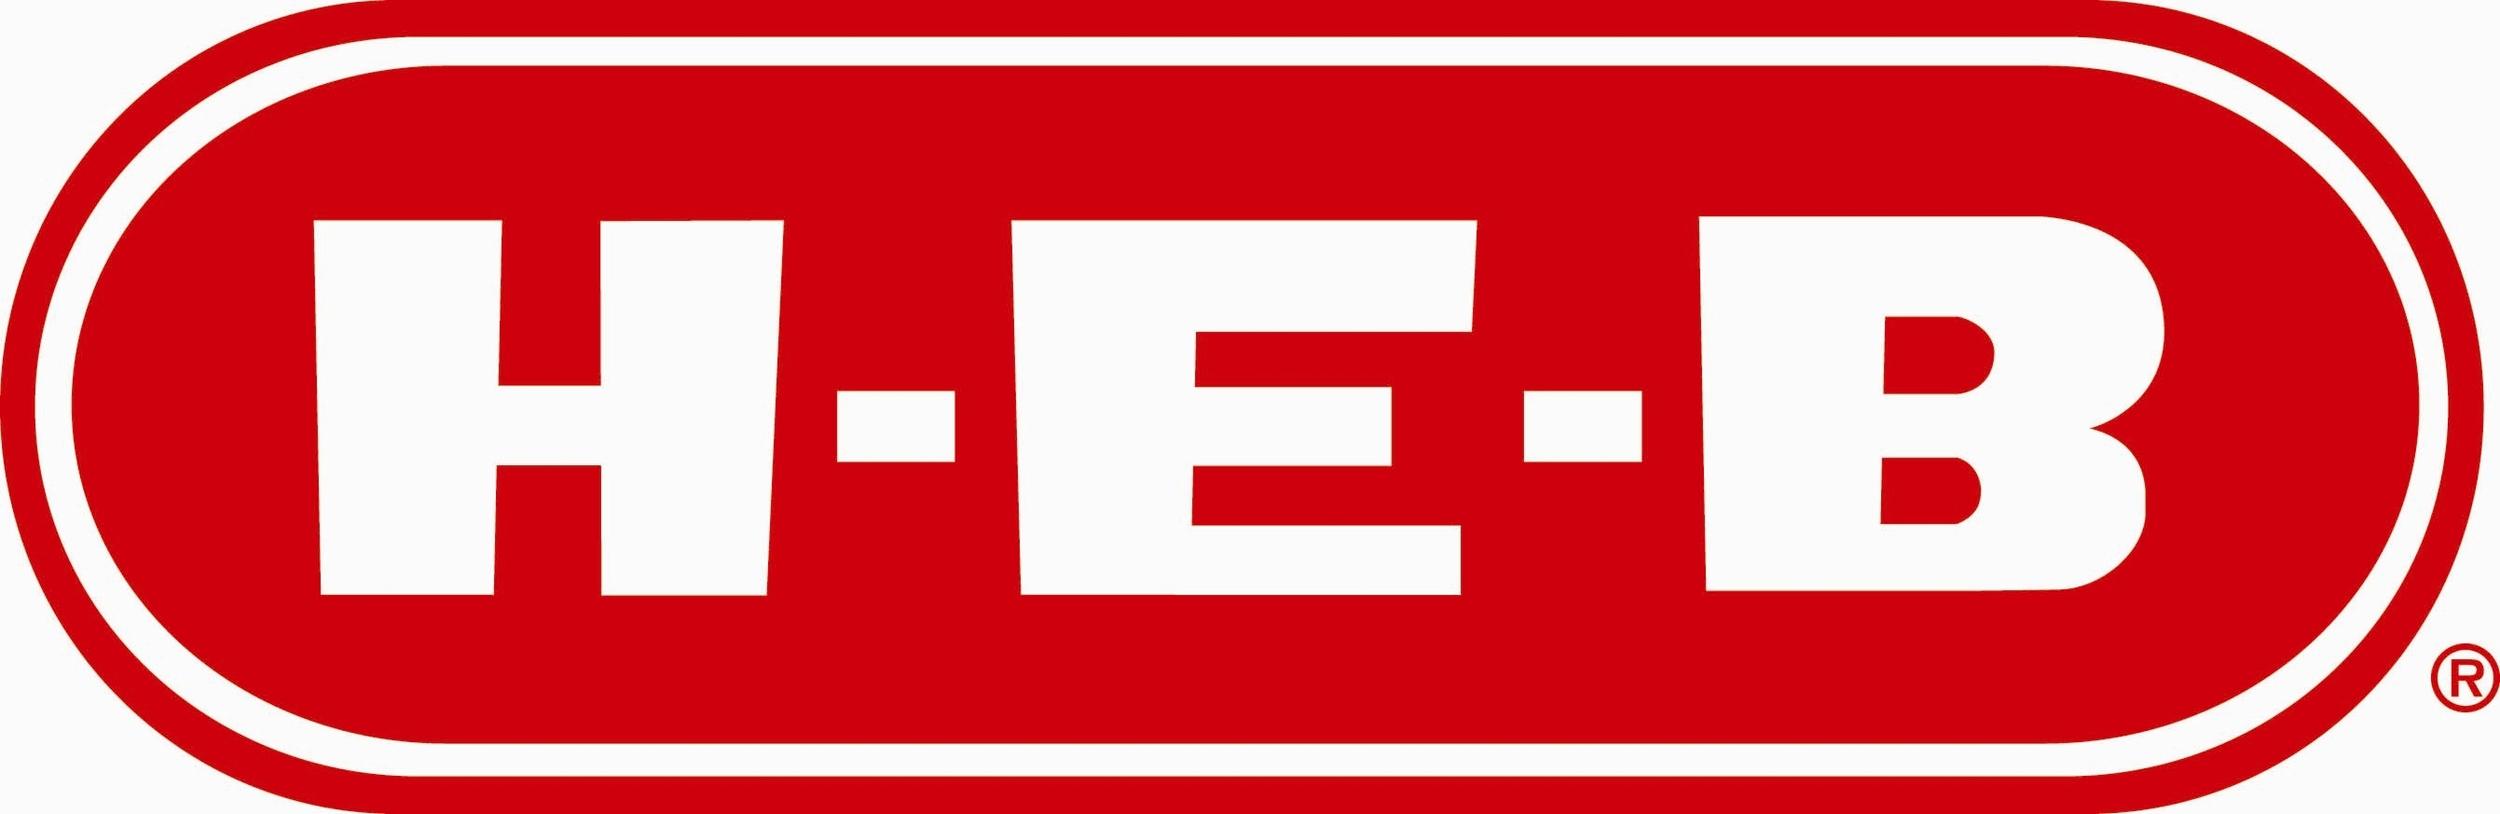 H-E-B Logo.jpg